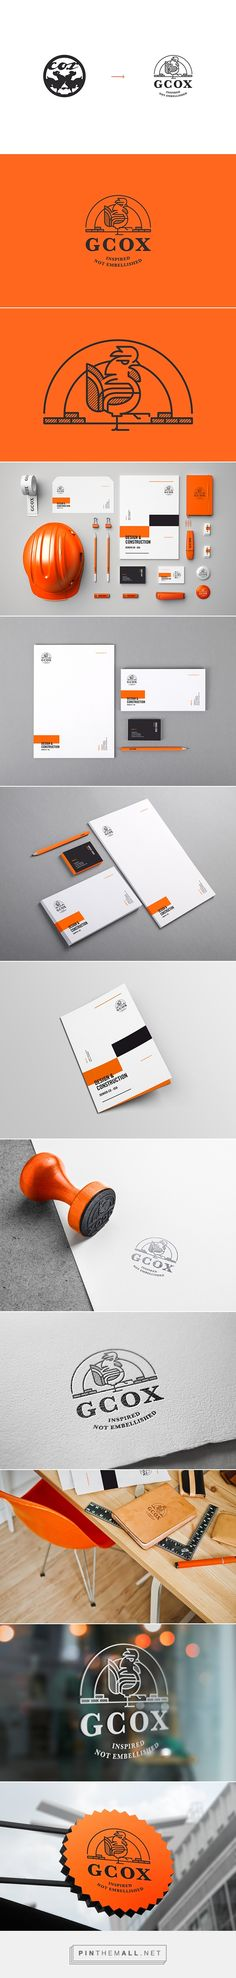 GCOX Branding | #logos #branding #identity